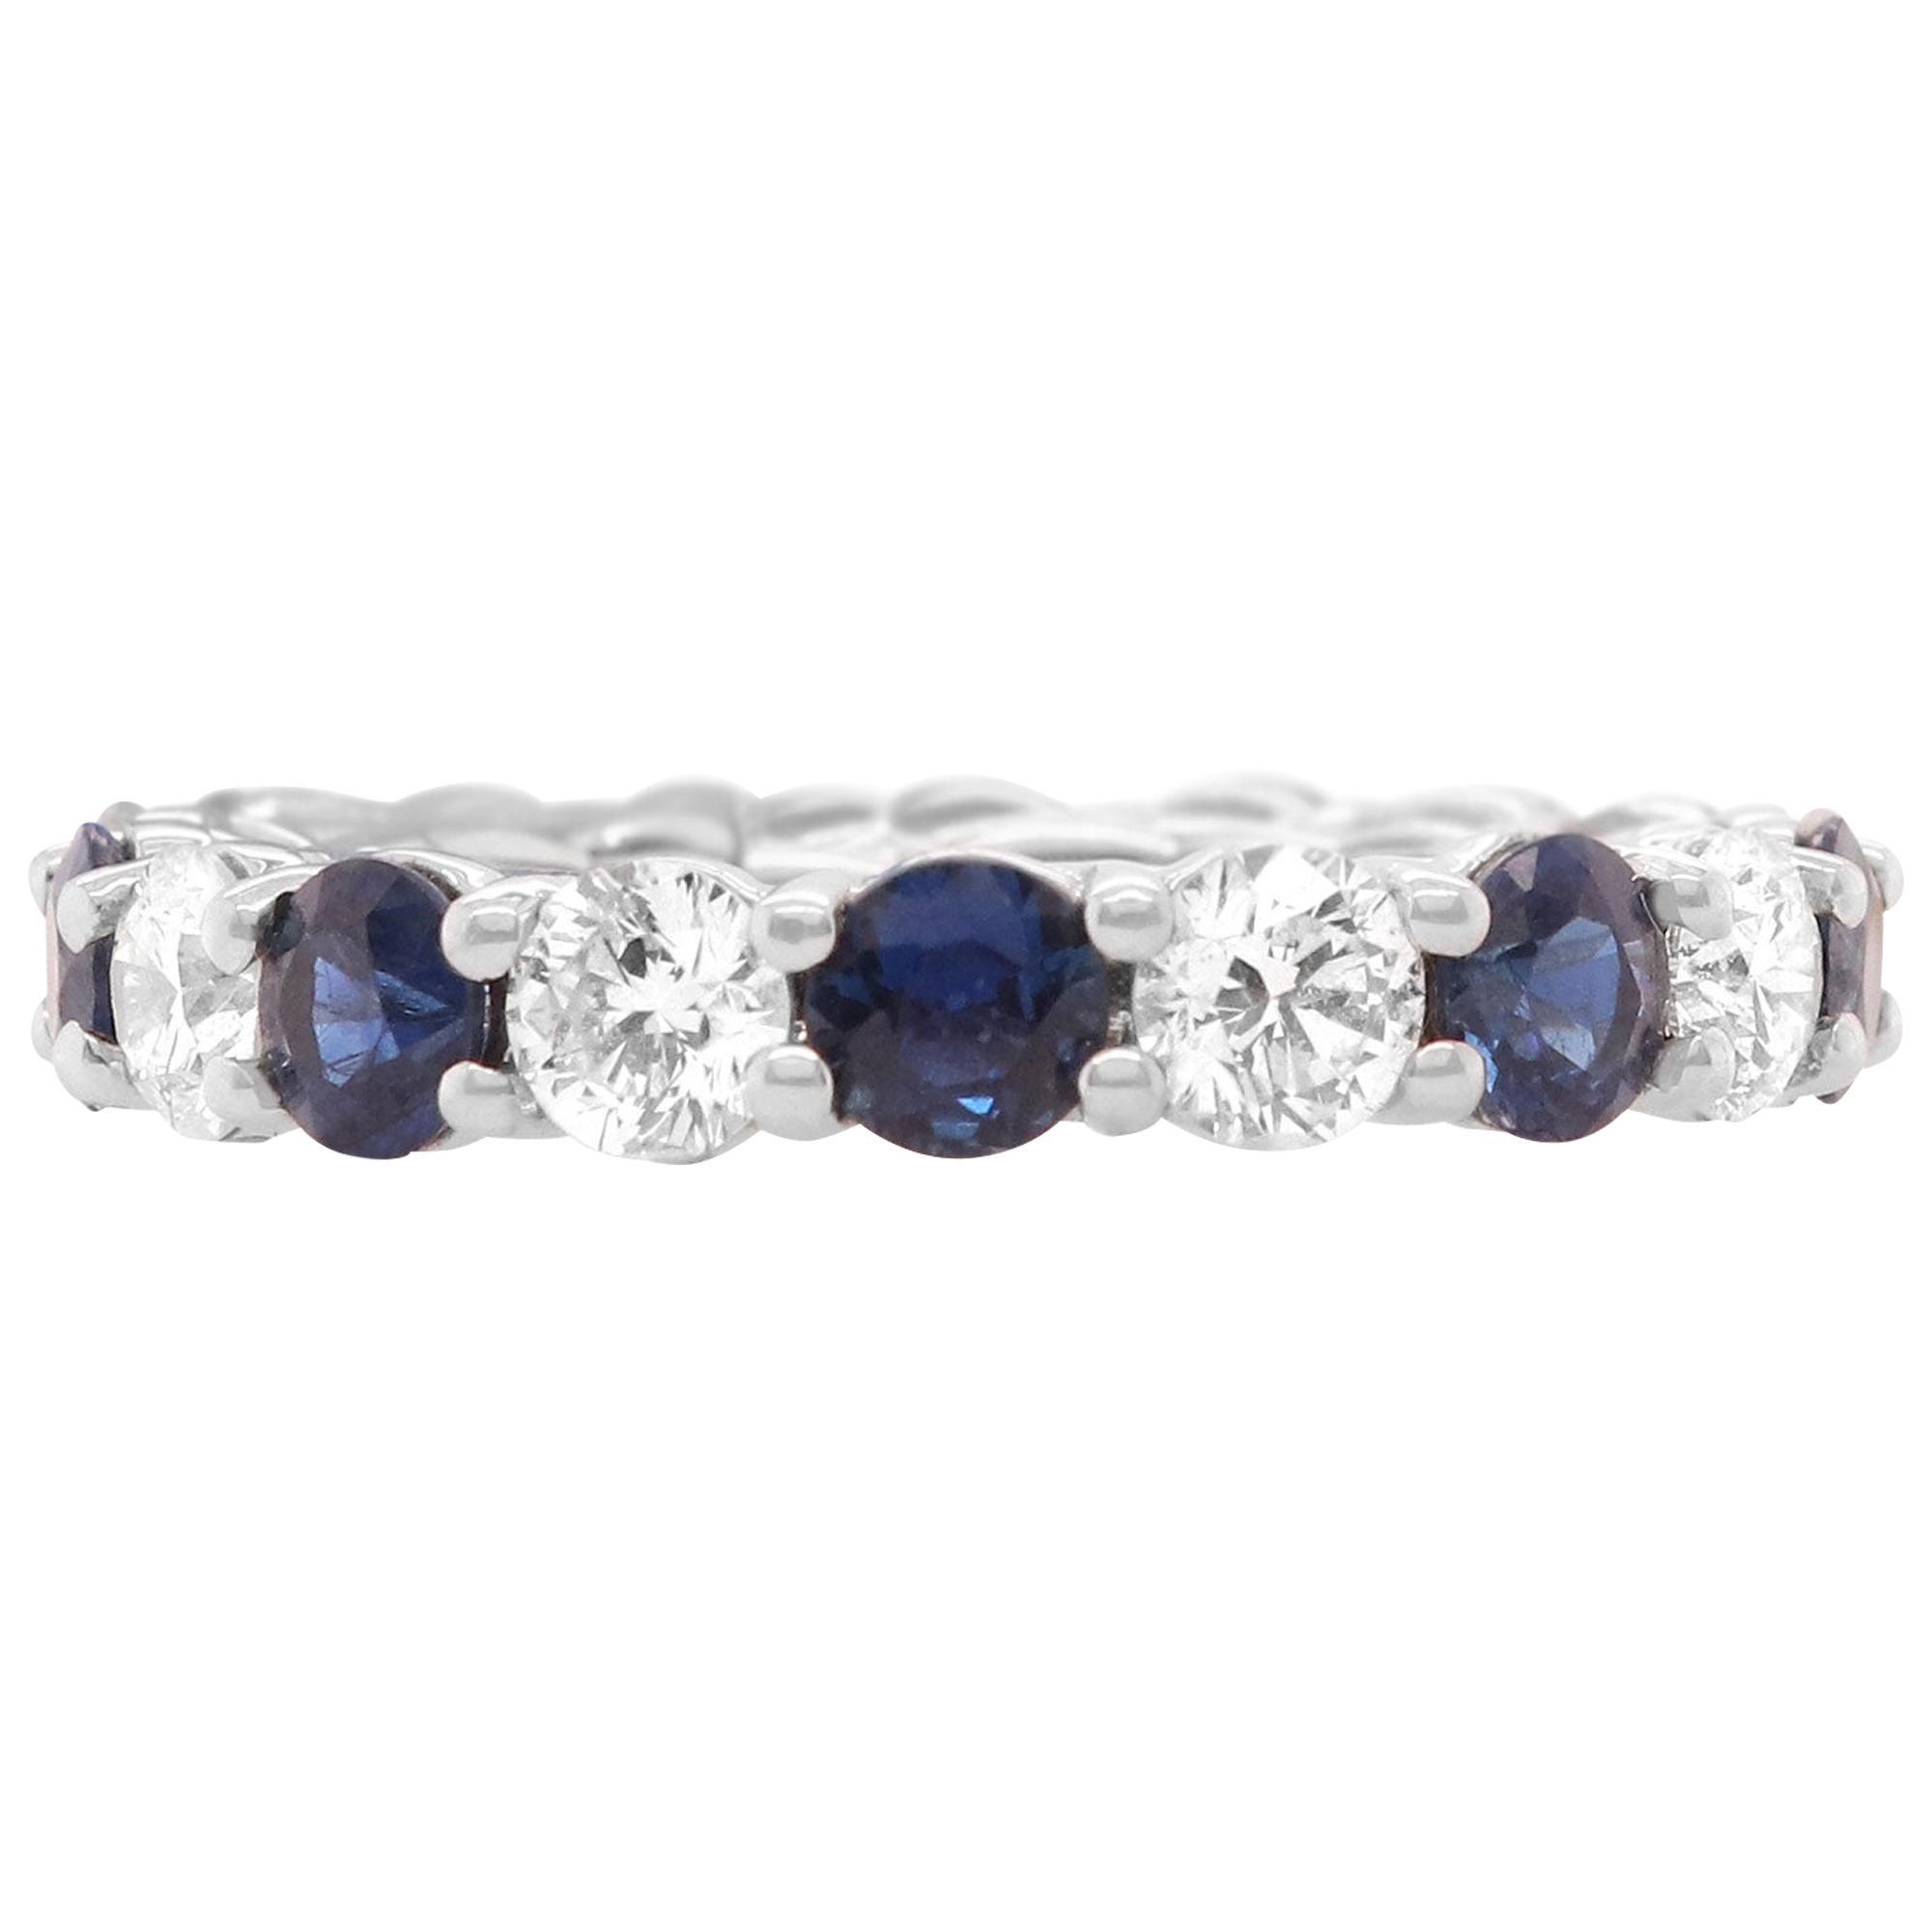 Round Blue Sapphire Diamond Eternity Band Ring 18K White Gold Size 5.75